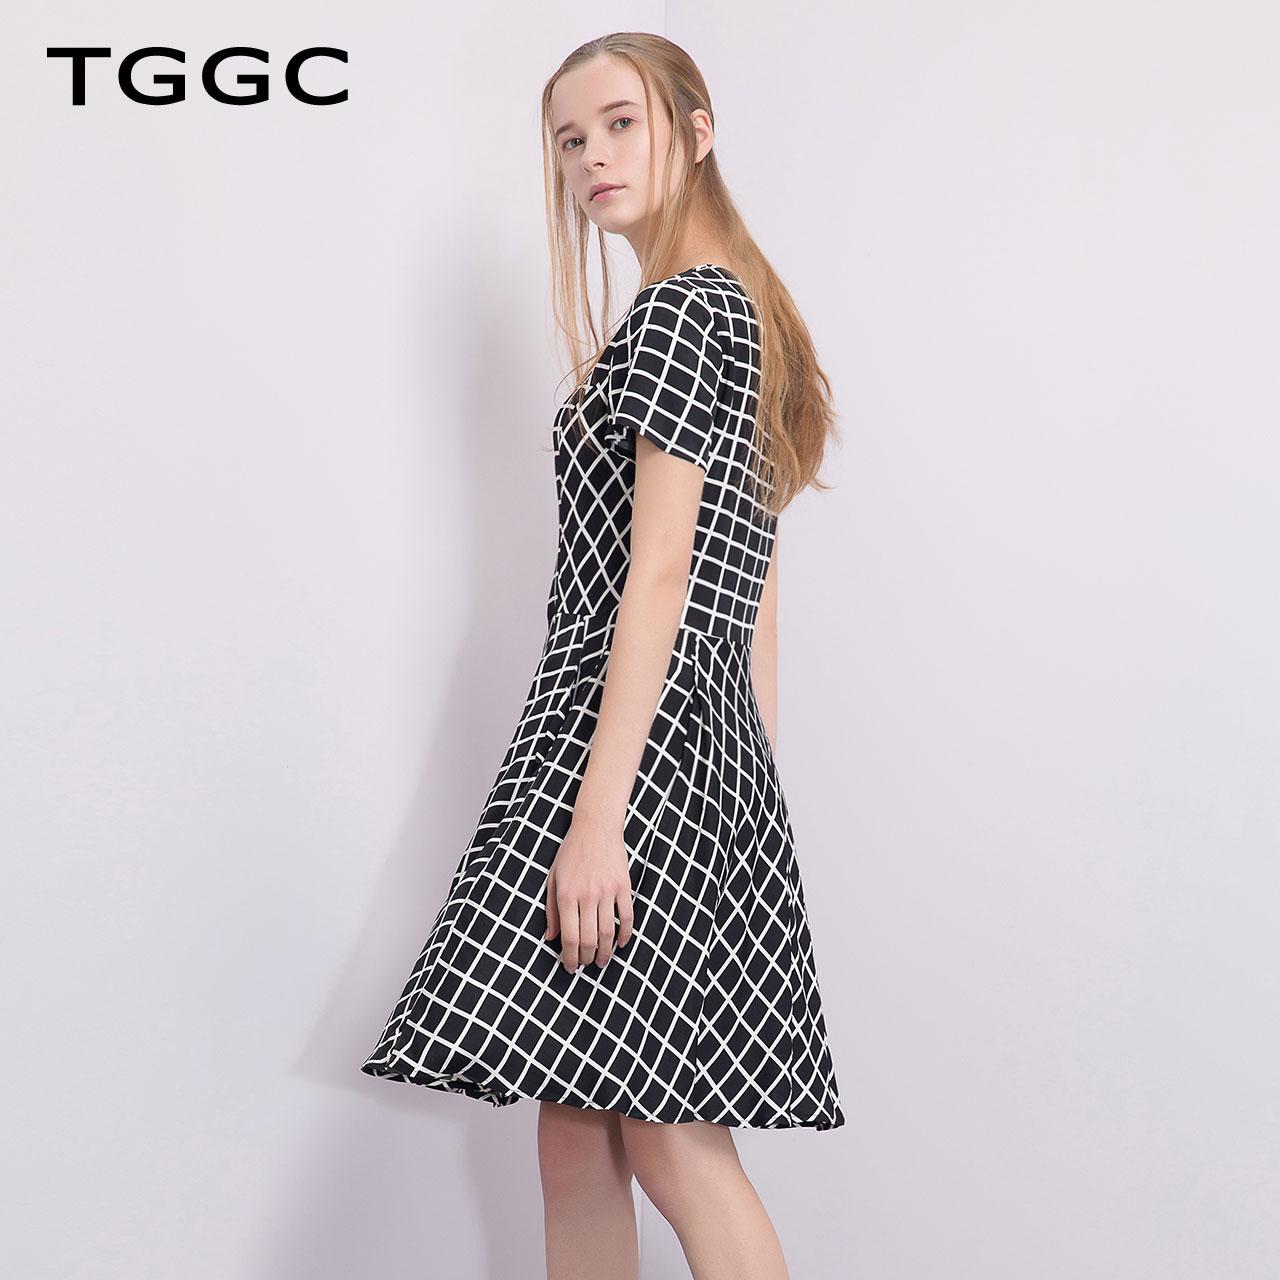 TGGC 2018年夏装 通勤OL高腰修身显瘦黑白格短袖连衣裙女 F20538